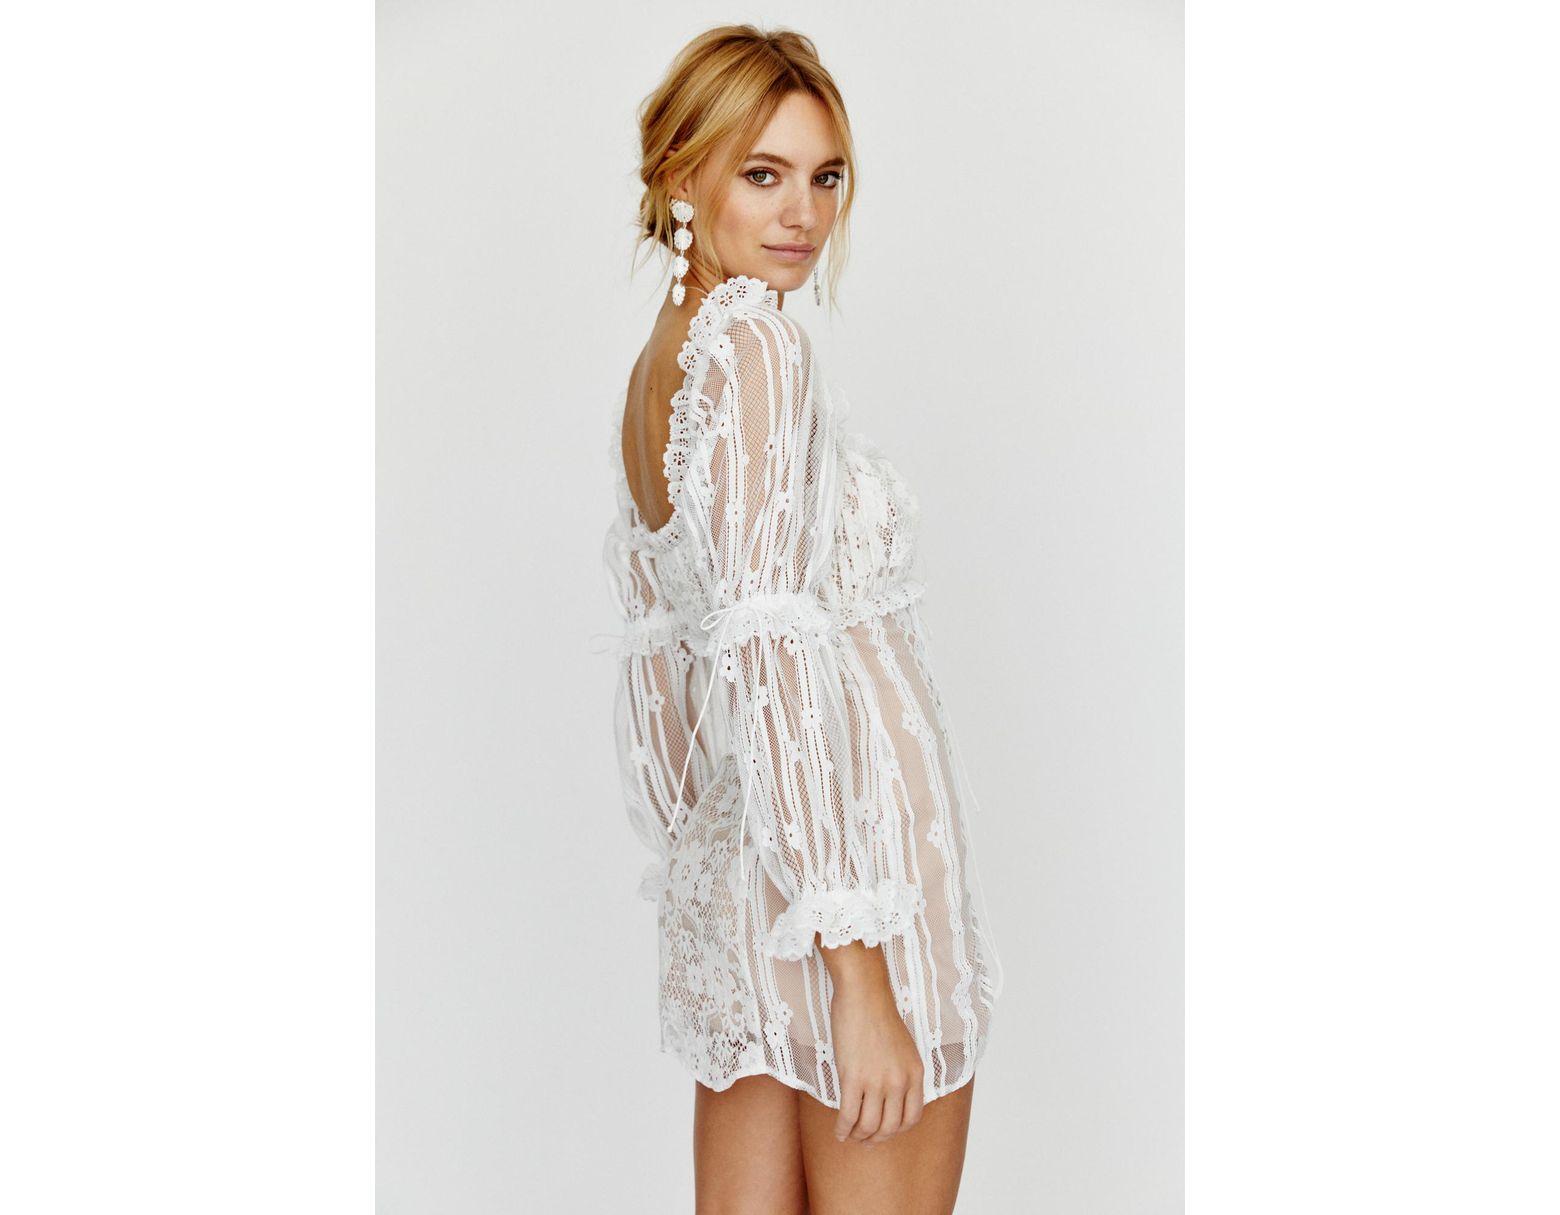 70439c2d0448 Free People Monroe Mini Dress By For Love & Lemons in White - Lyst